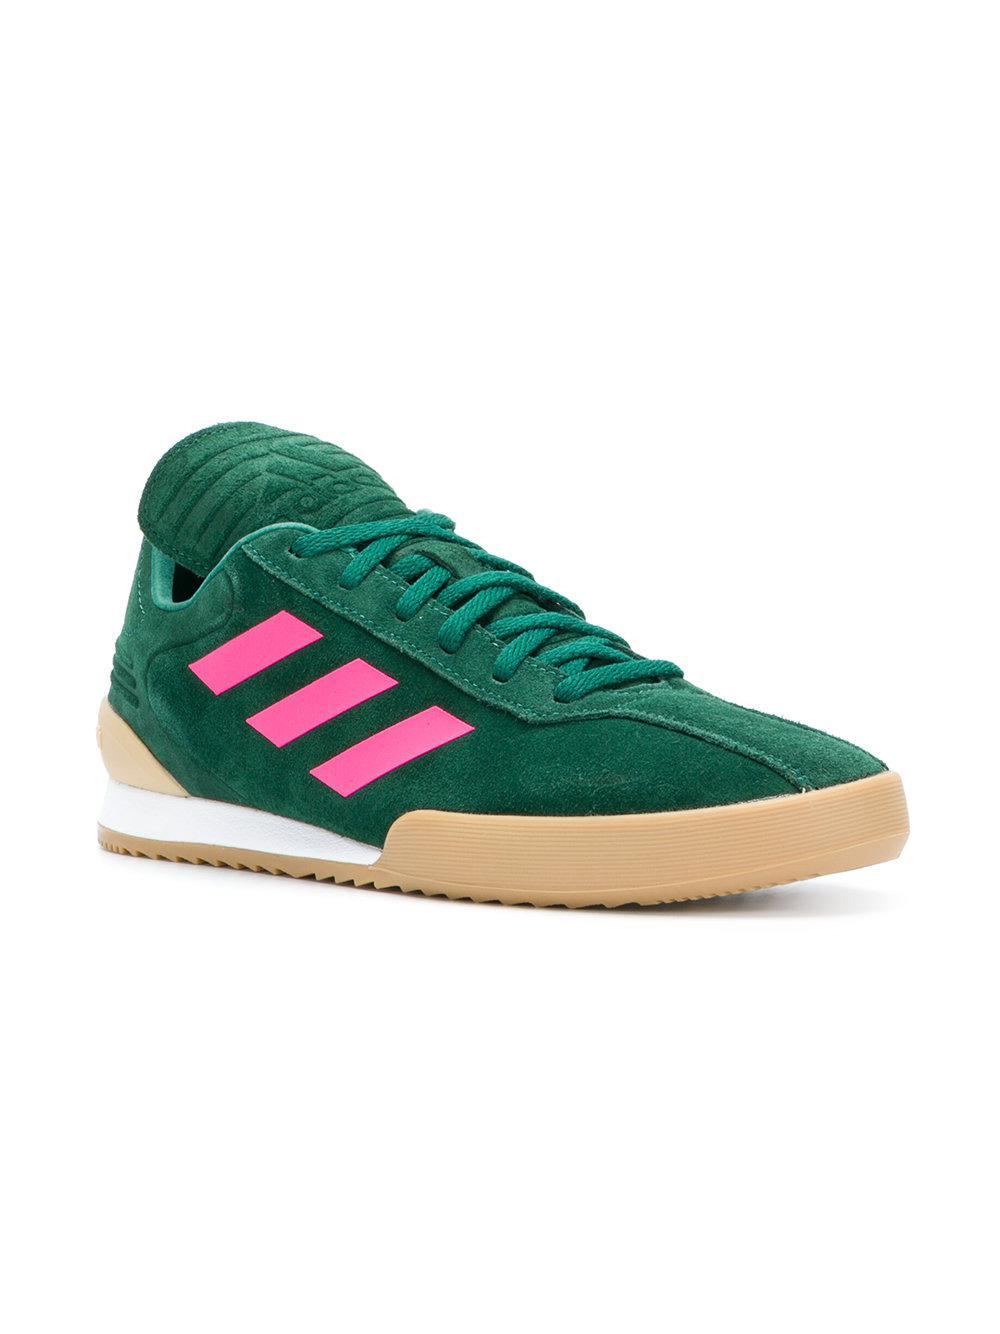 newest 09a31 15a04 Gosha Rubchinskiy - Green Side Stripe Sneakers for Men - Lyst. View  fullscreen